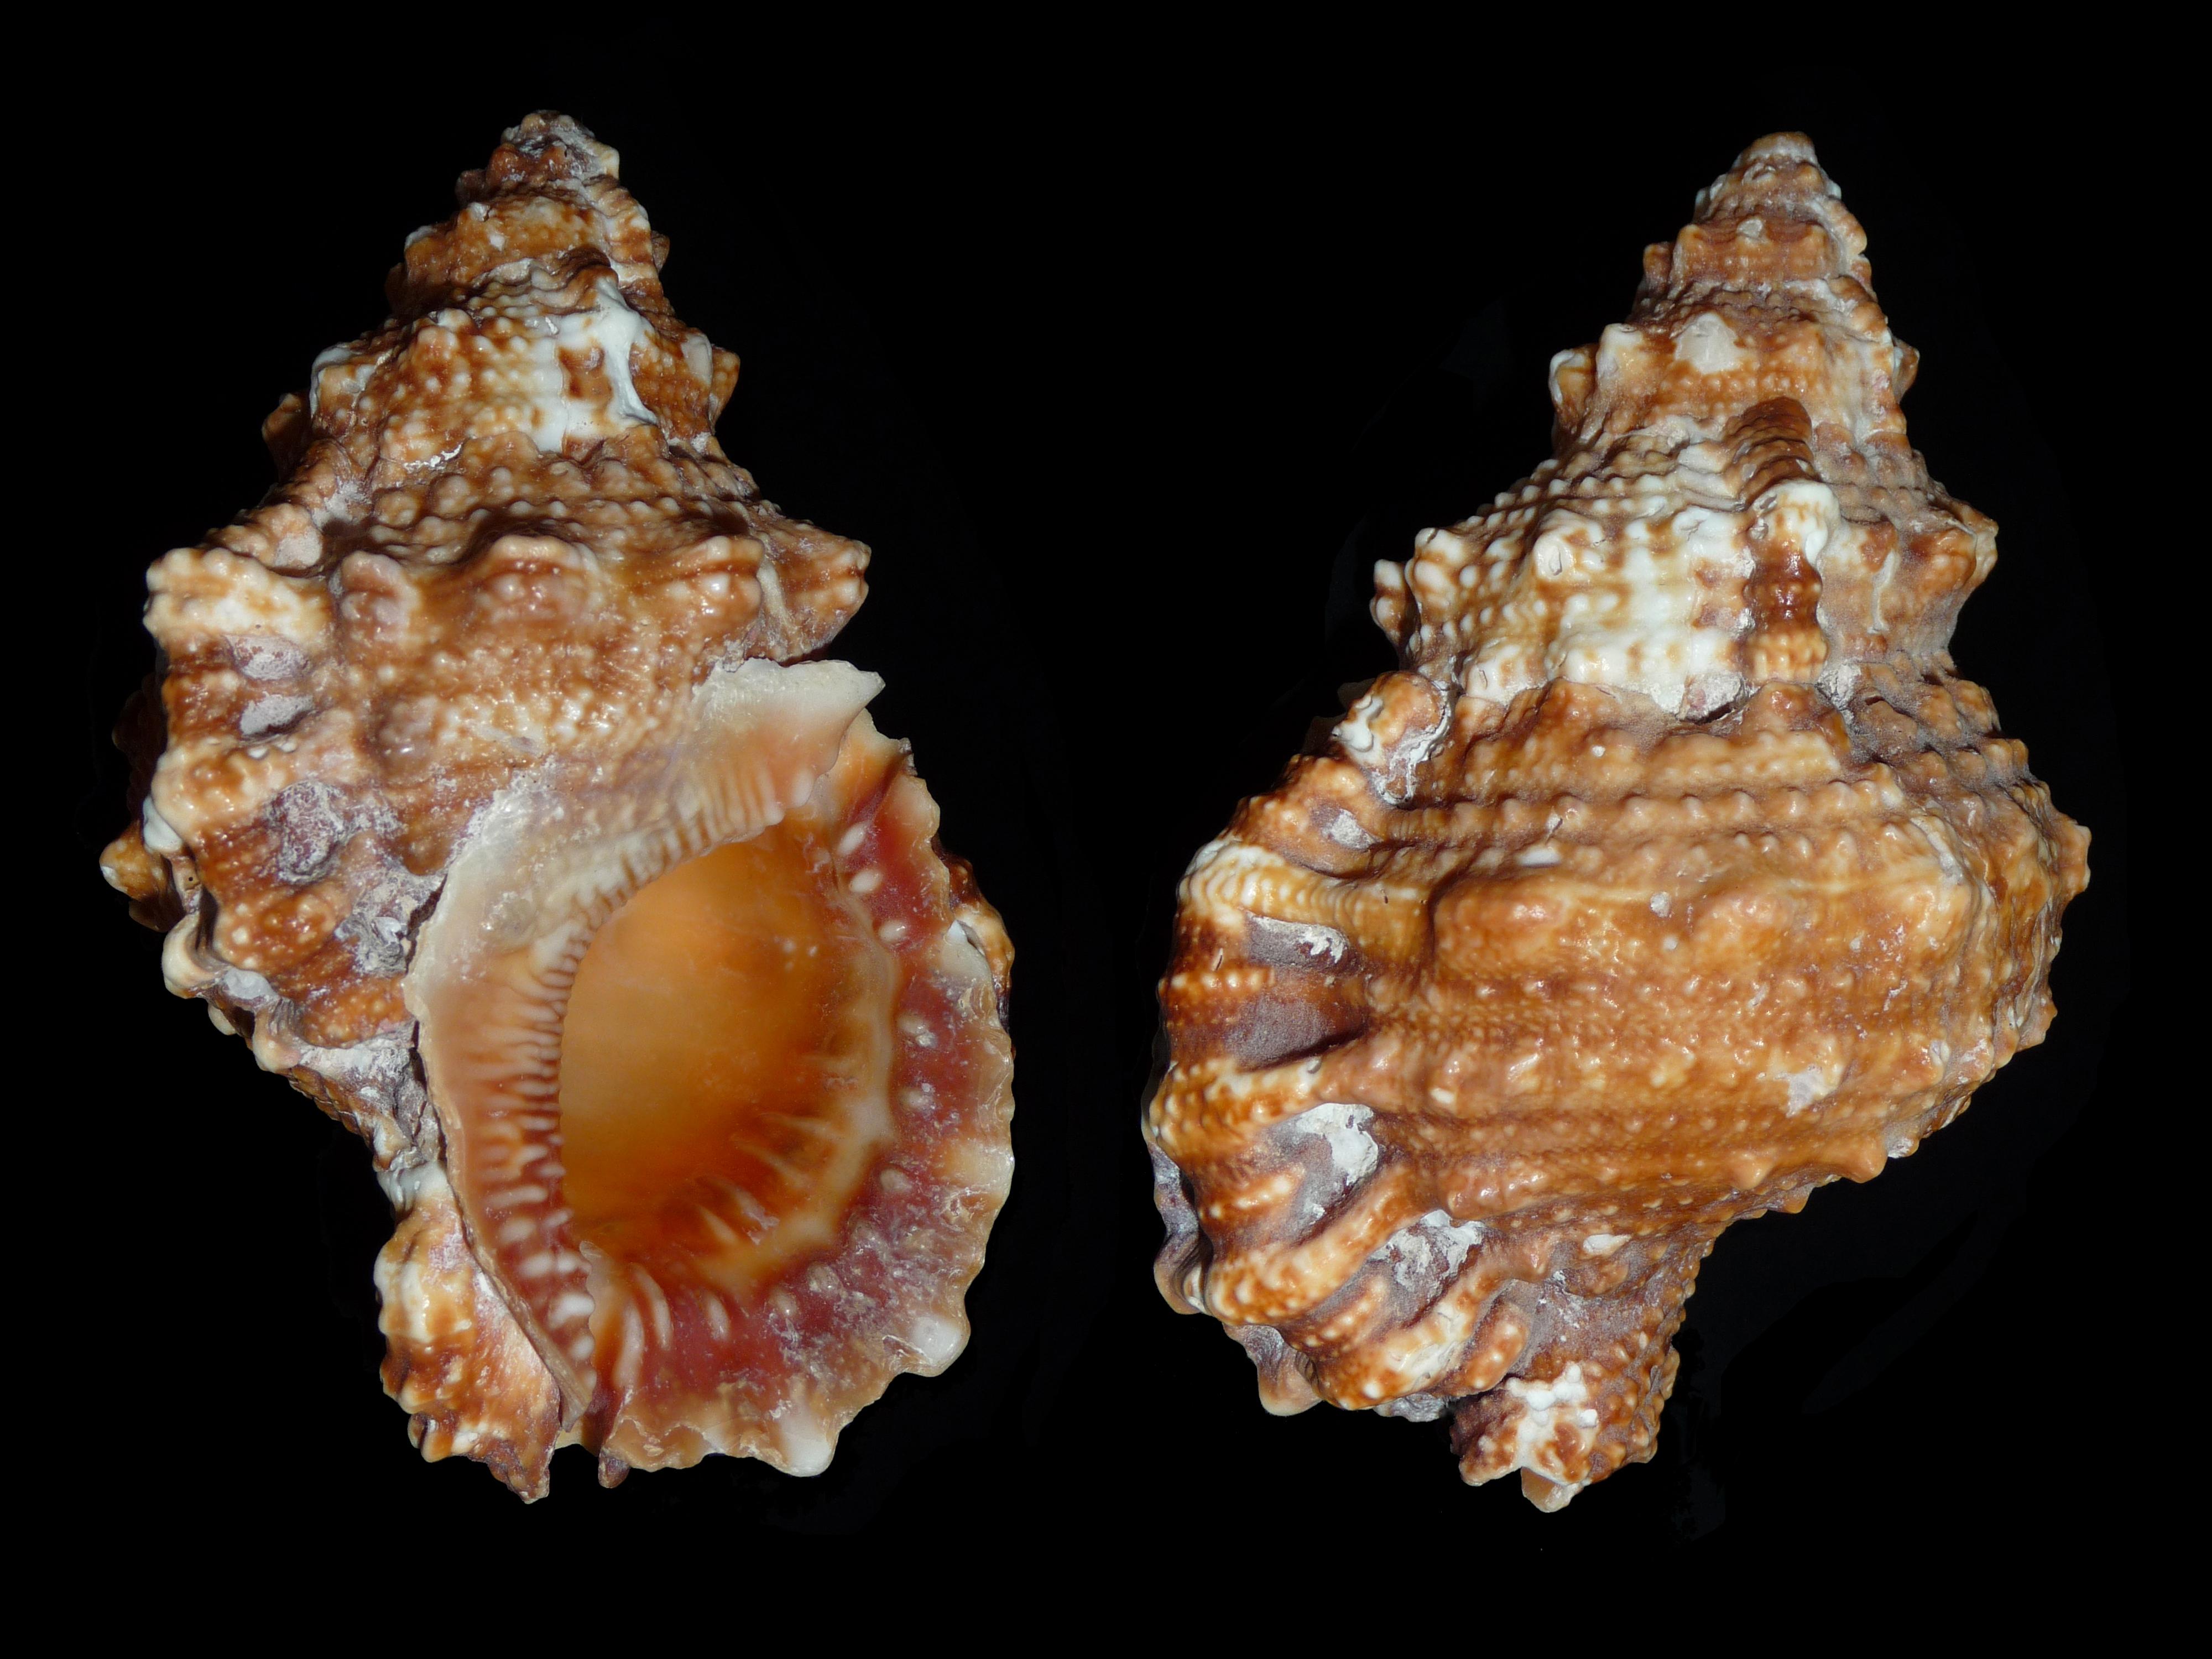 Bursa granularis (Röding, 1798)  Tutufa_rubeta_2010_G1